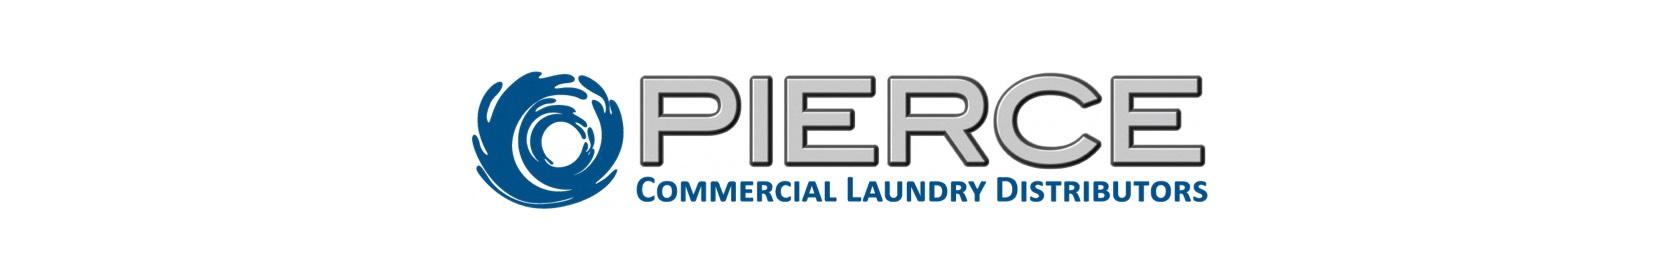 Pierce Commercial Laundry Logo